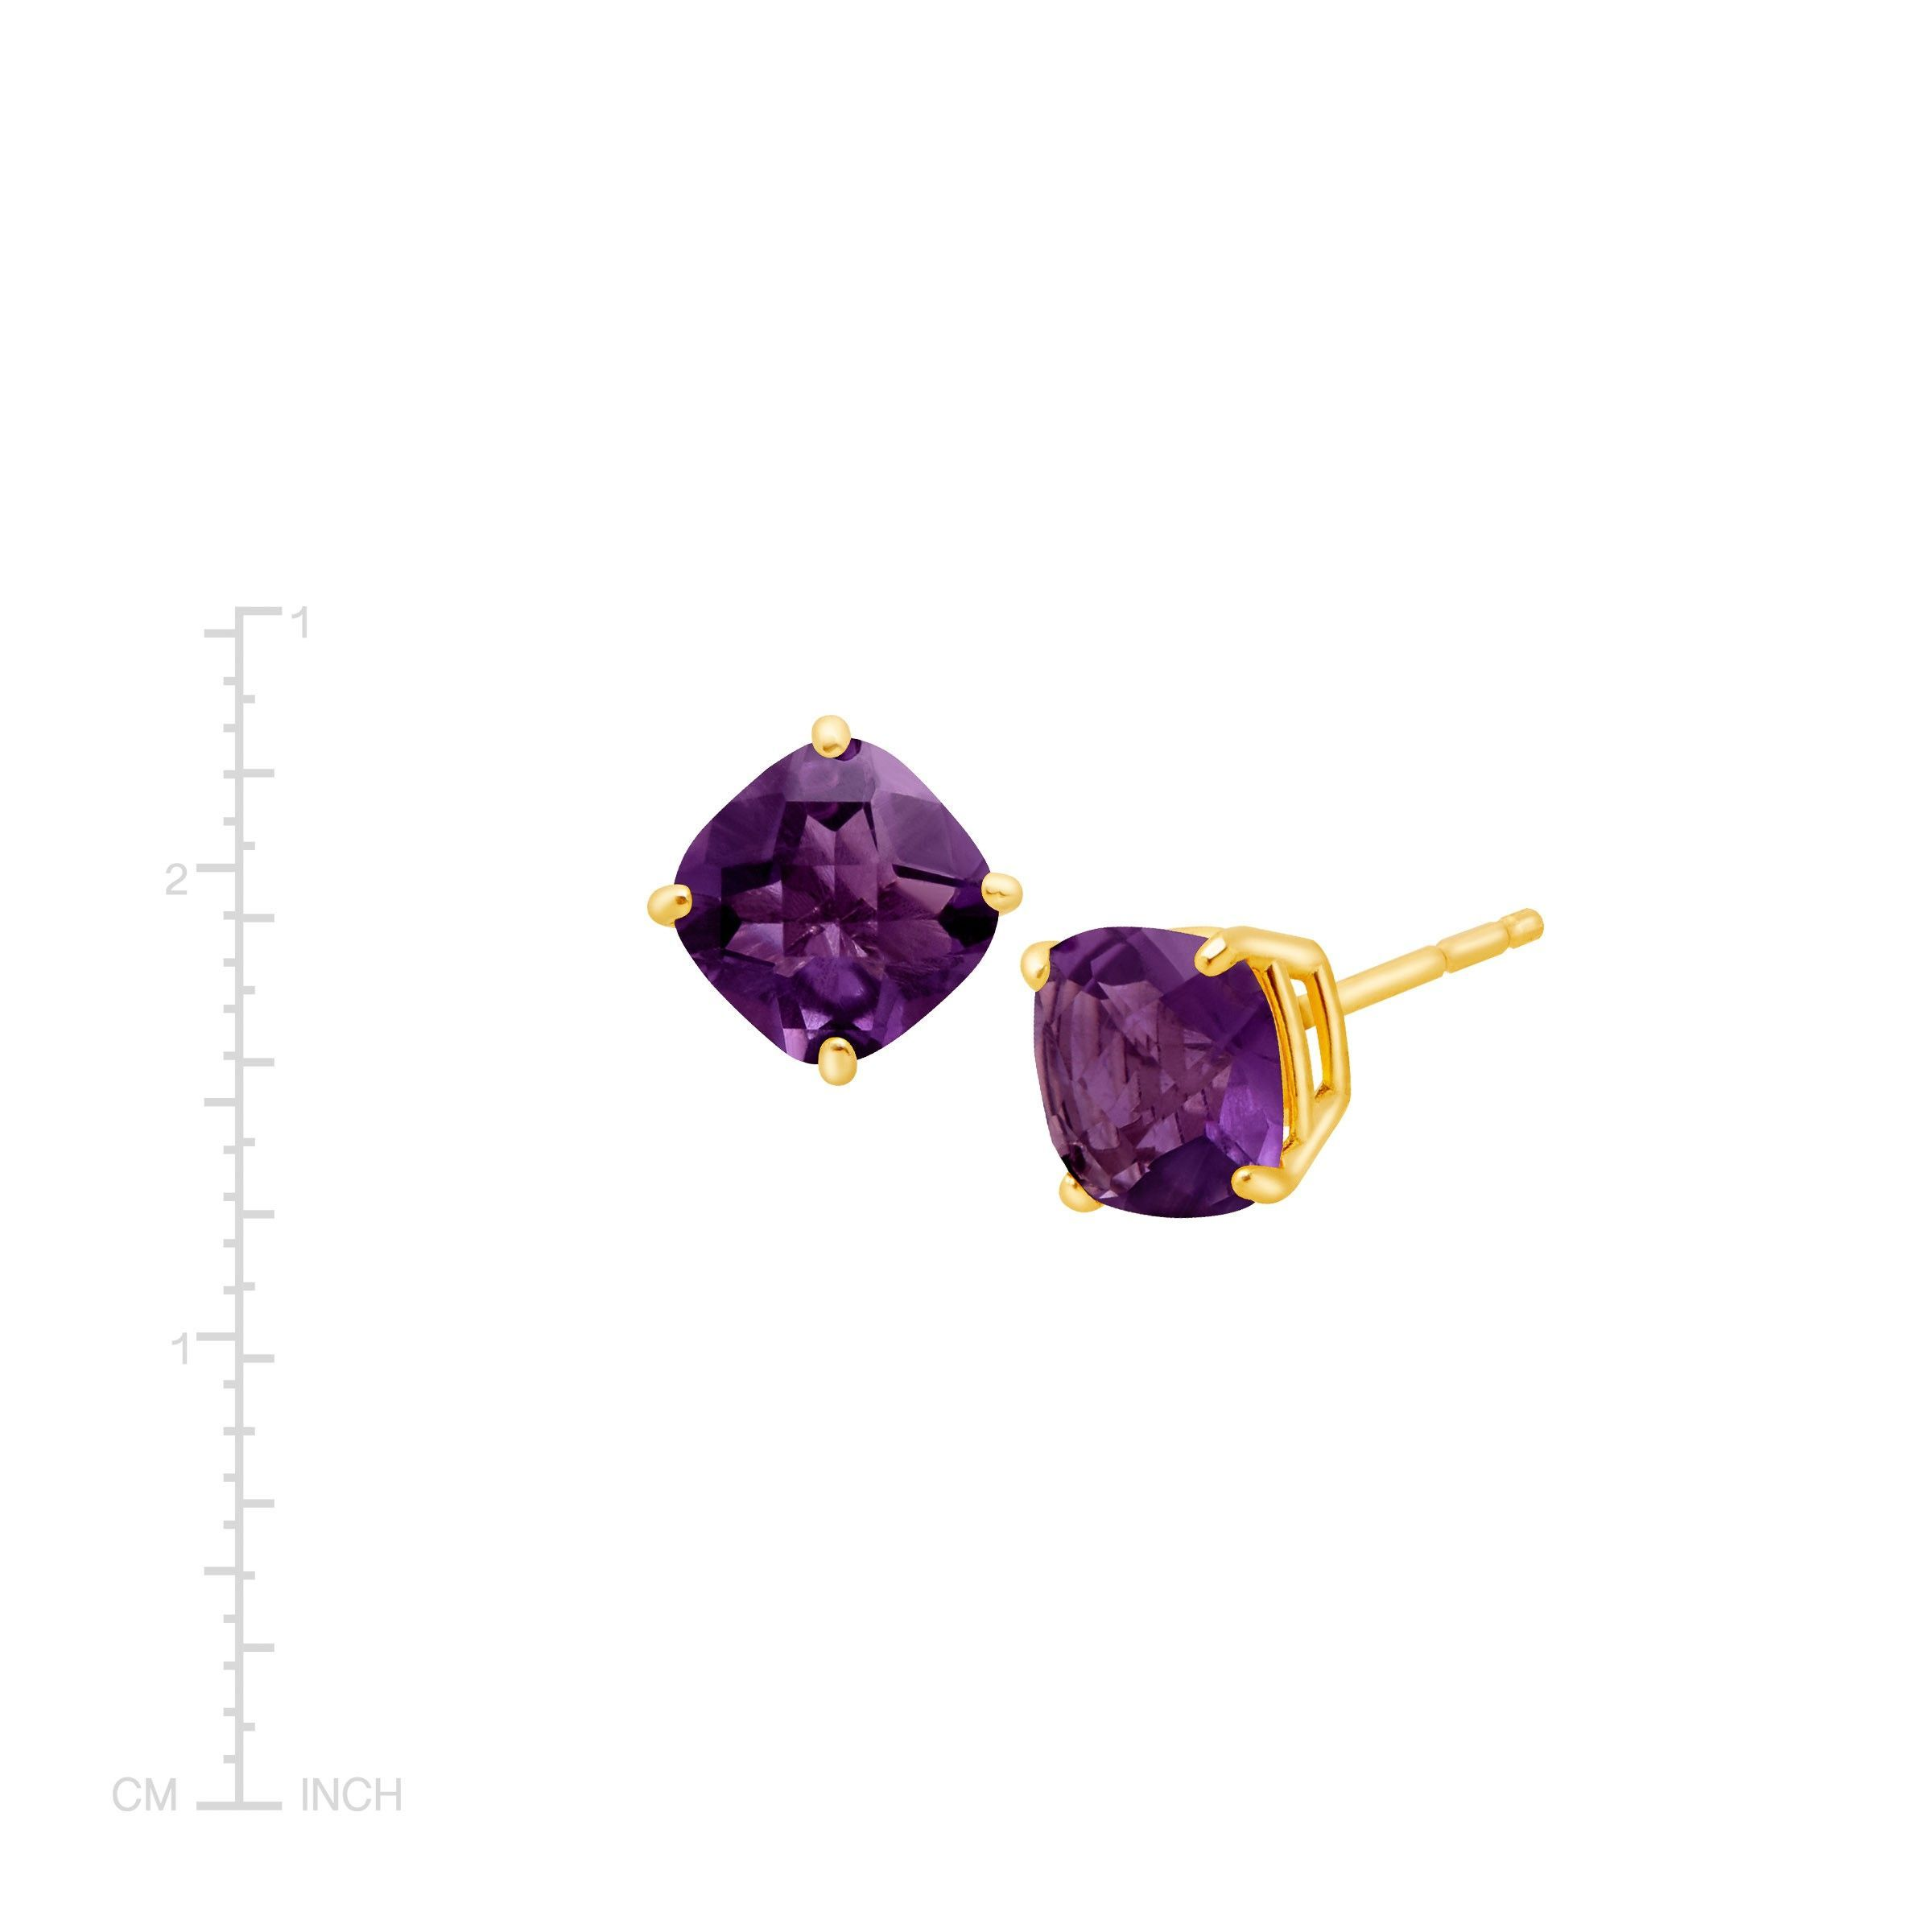 Cushion-Cut-Color-Stone-Stud-Earrings-in-14K-Gold thumbnail 8